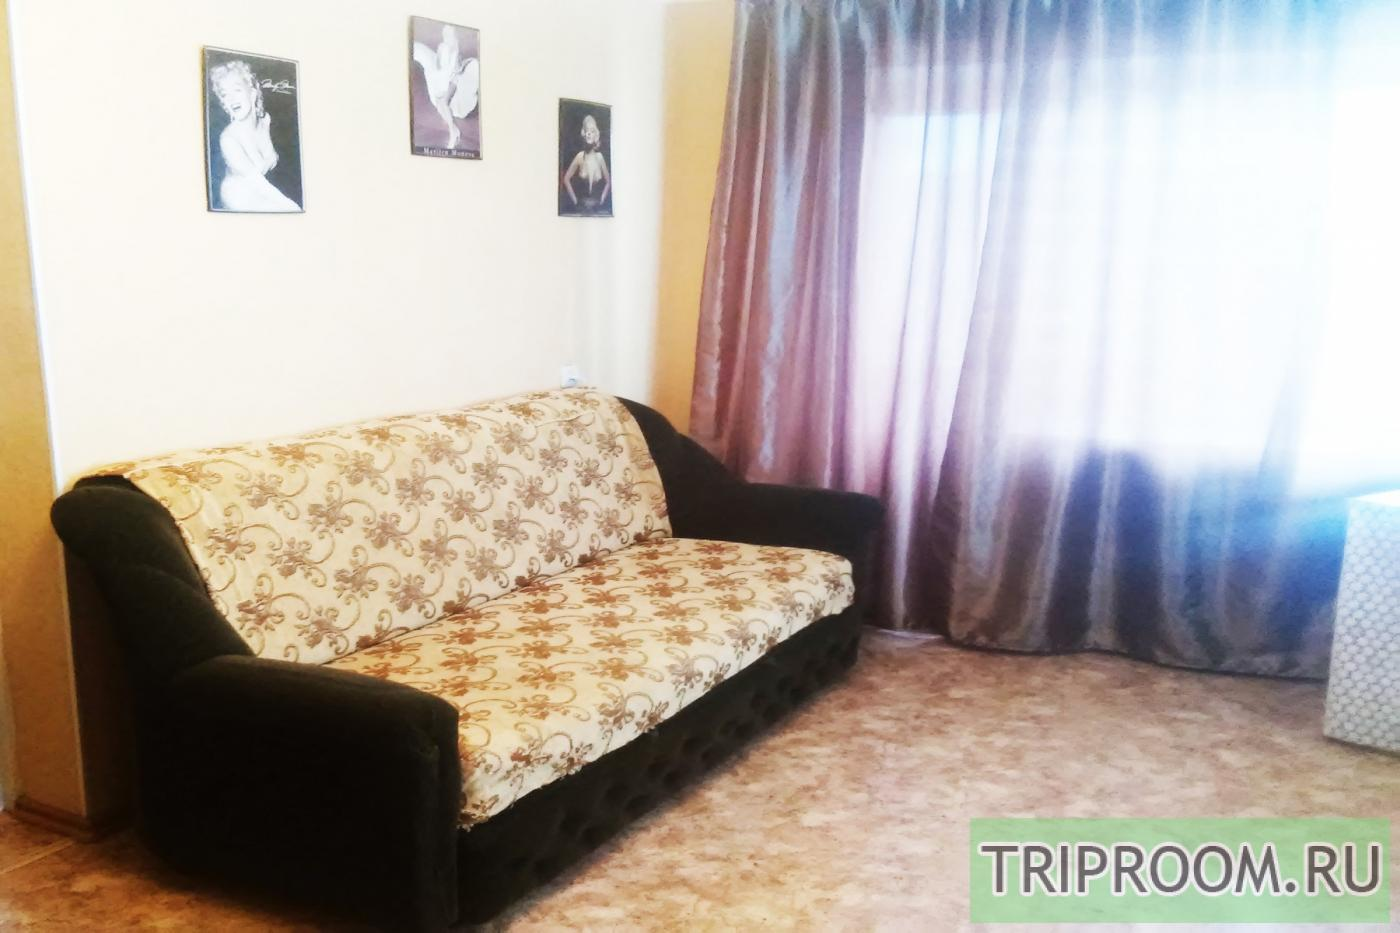 1-комнатная квартира посуточно (вариант № 34542), ул. Маршала Рыбалко, фото № 3